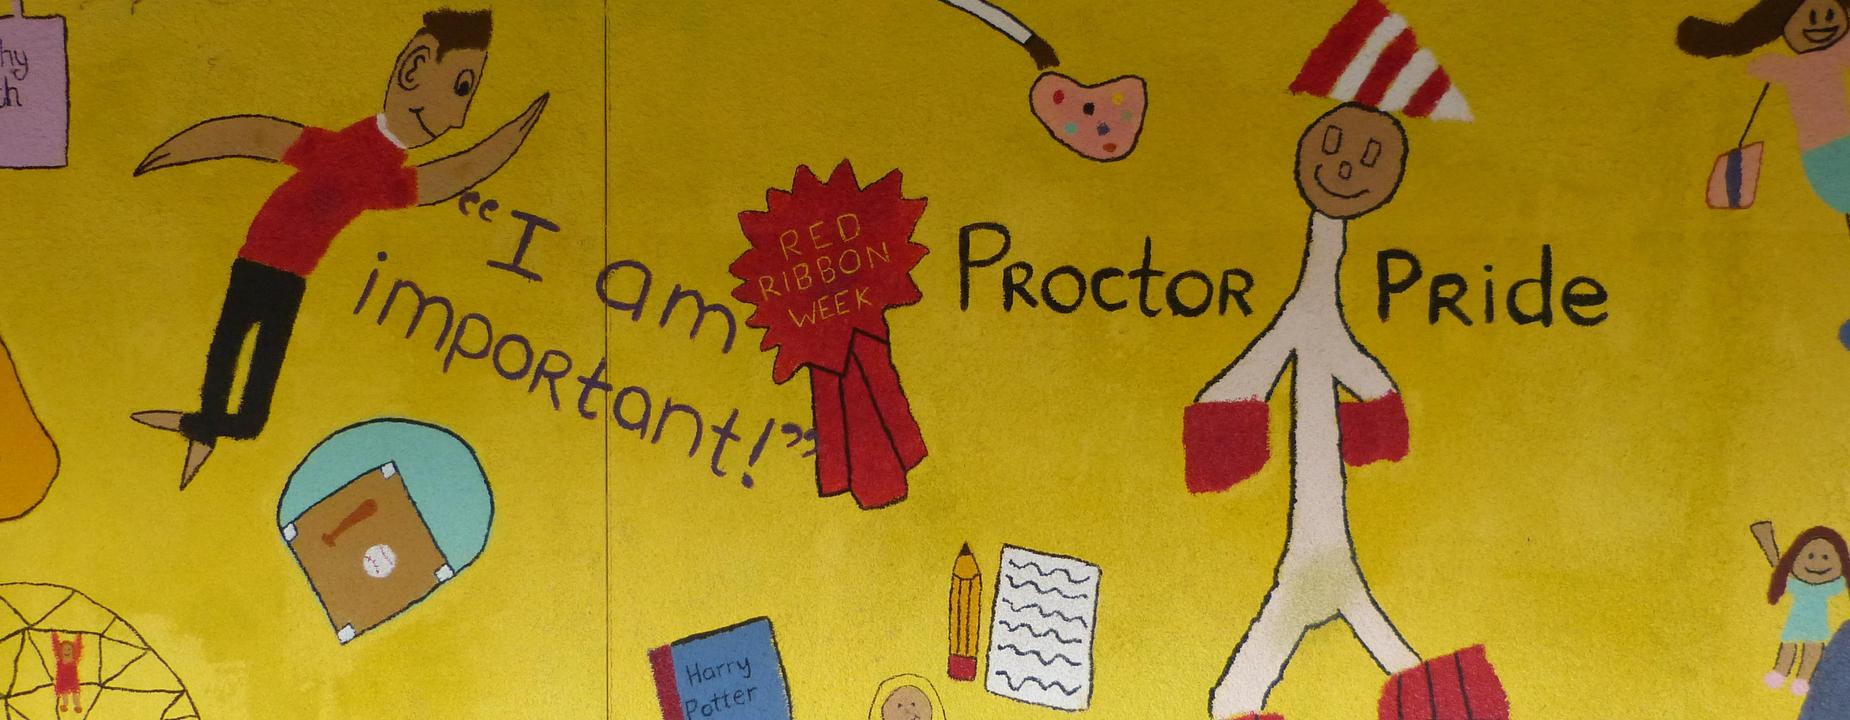 Proctor Elementary School Inside Castro Valley School District Calendar 2021